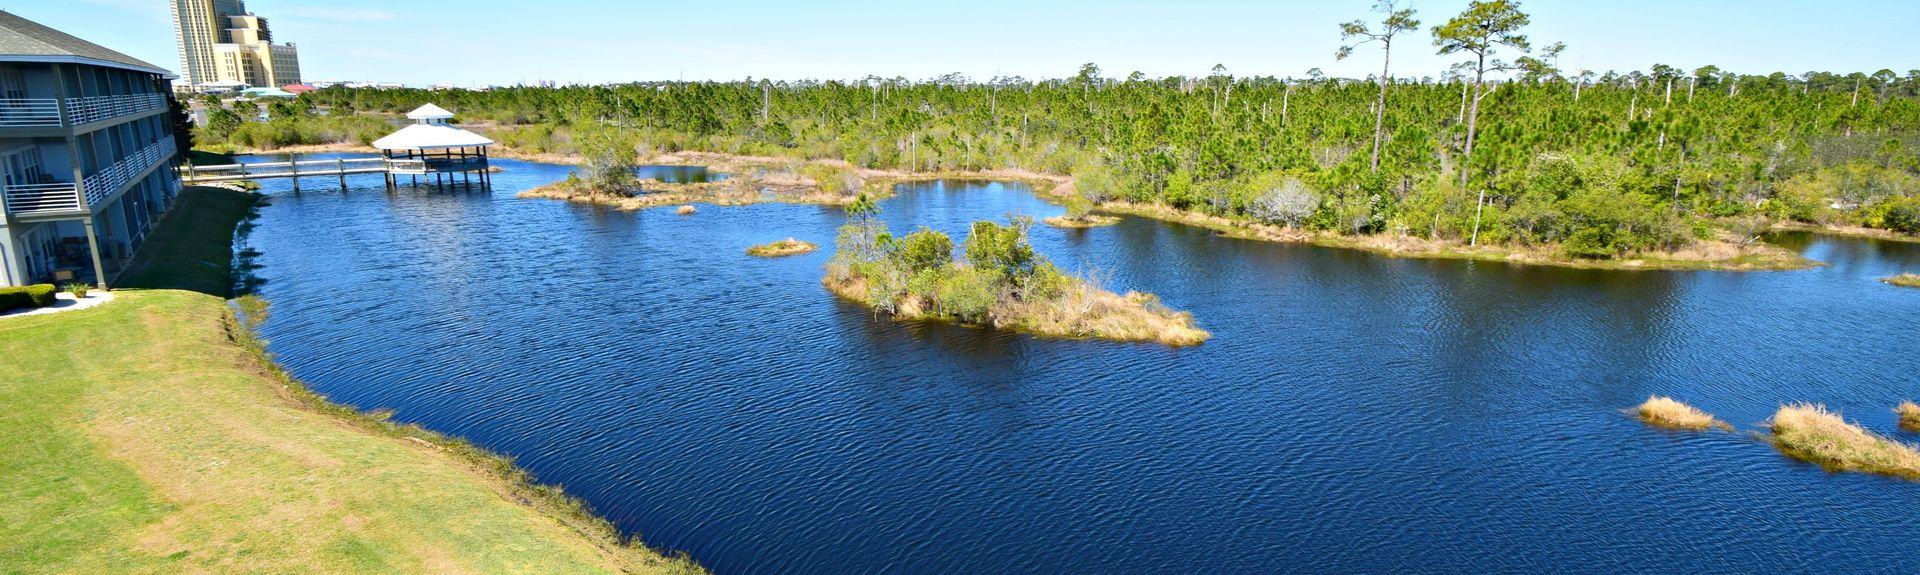 Romar Lakes (Orange Beach, Alabama, Estados Unidos)